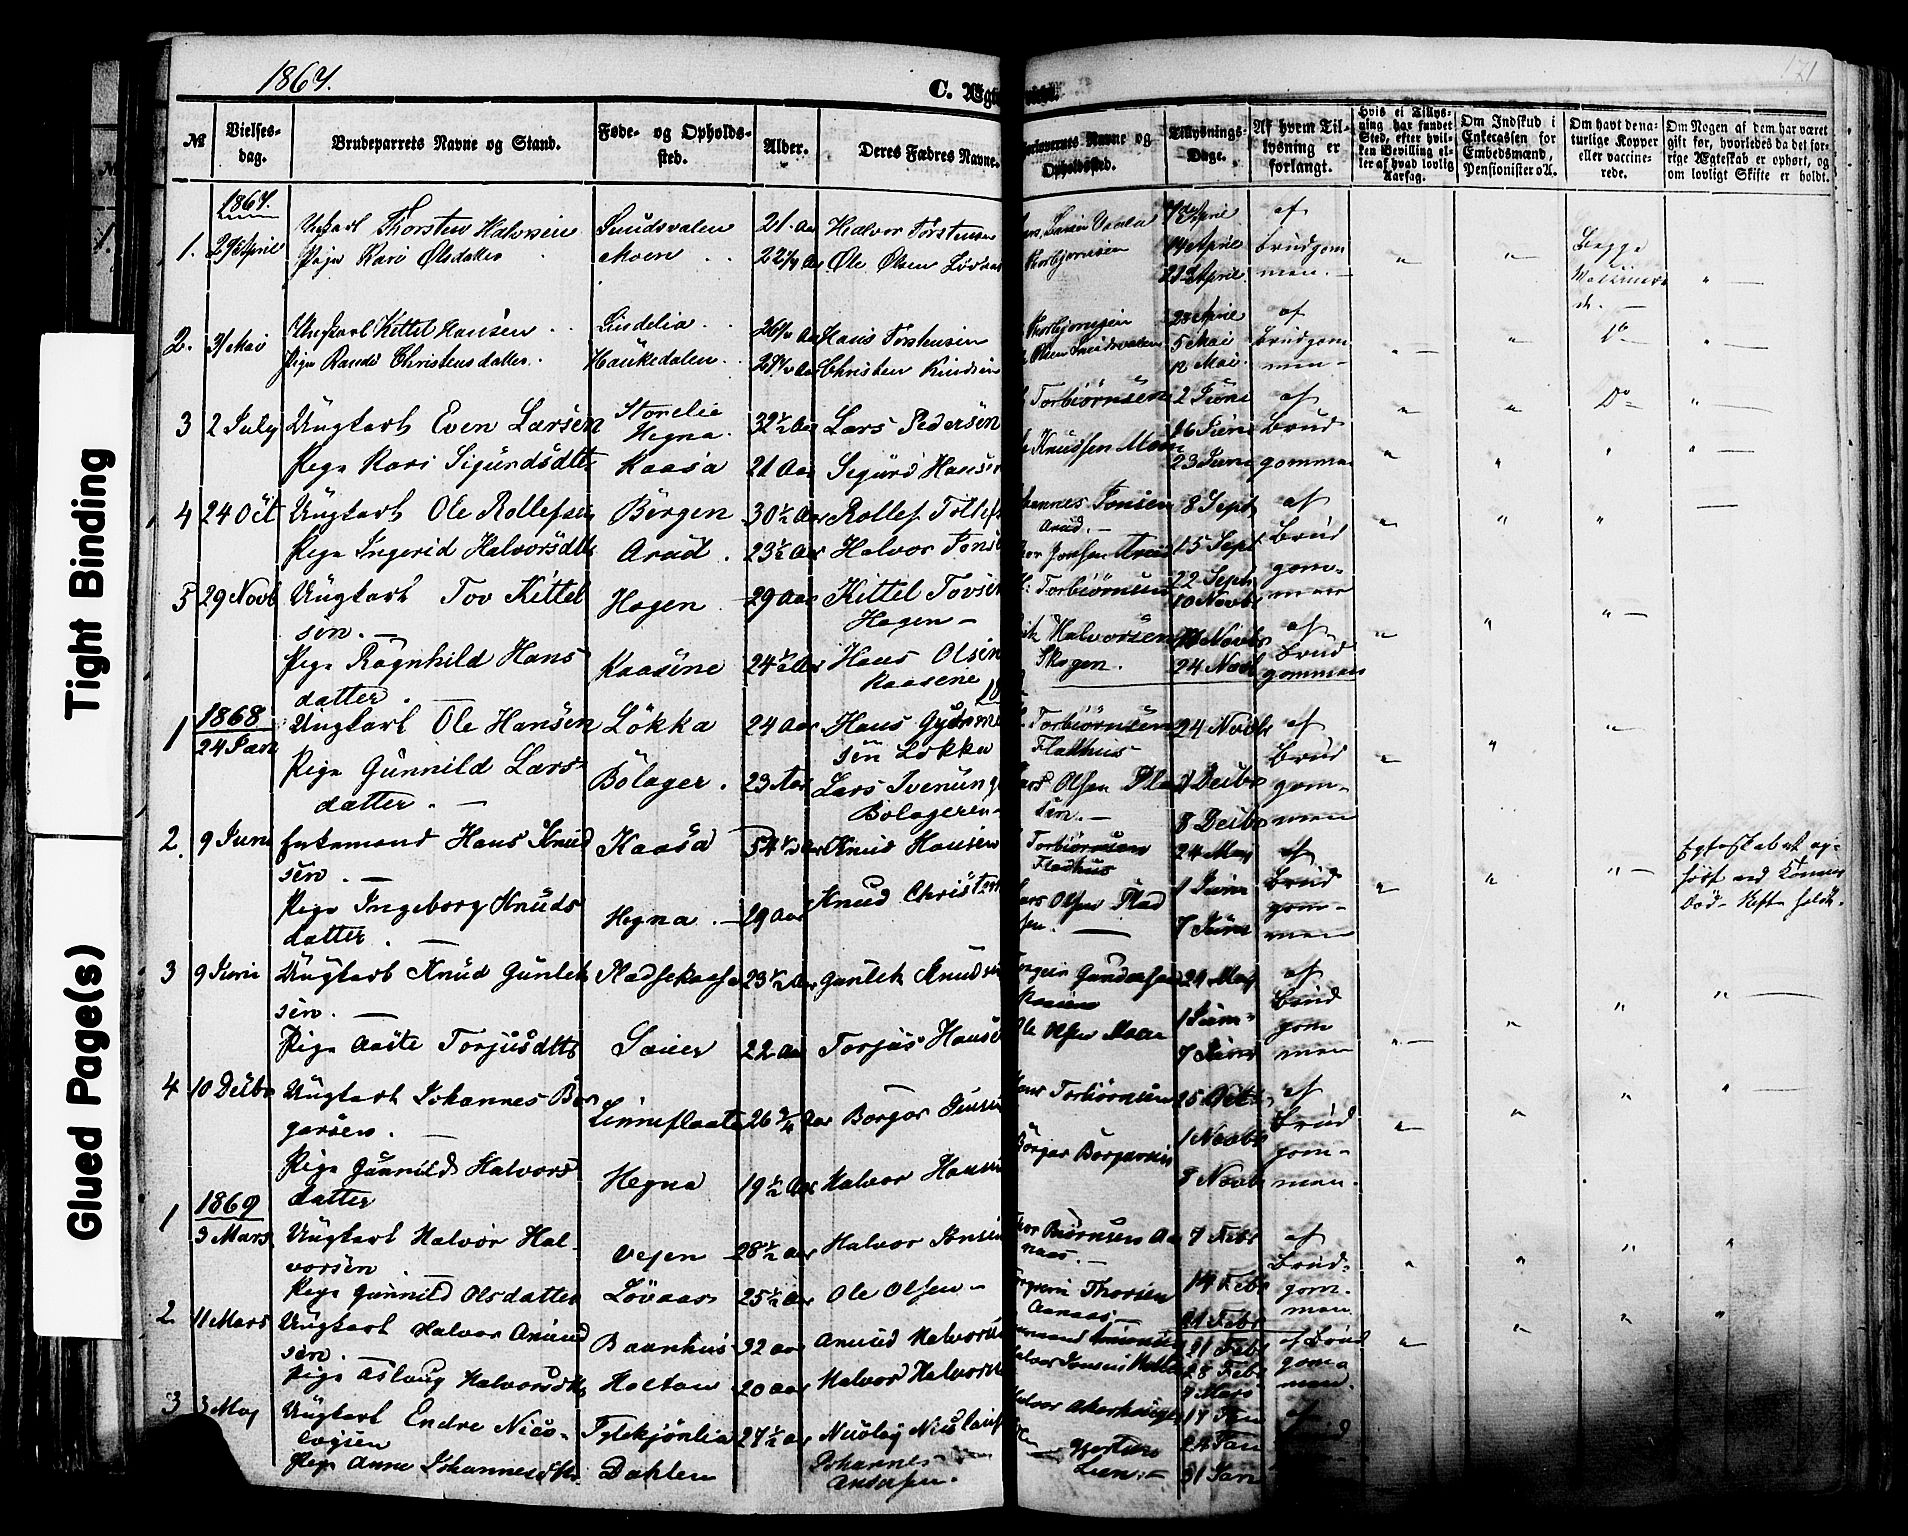 SAKO, Sauherad kirkebøker, F/Fa/L0007: Ministerialbok nr. I 7, 1851-1873, s. 171